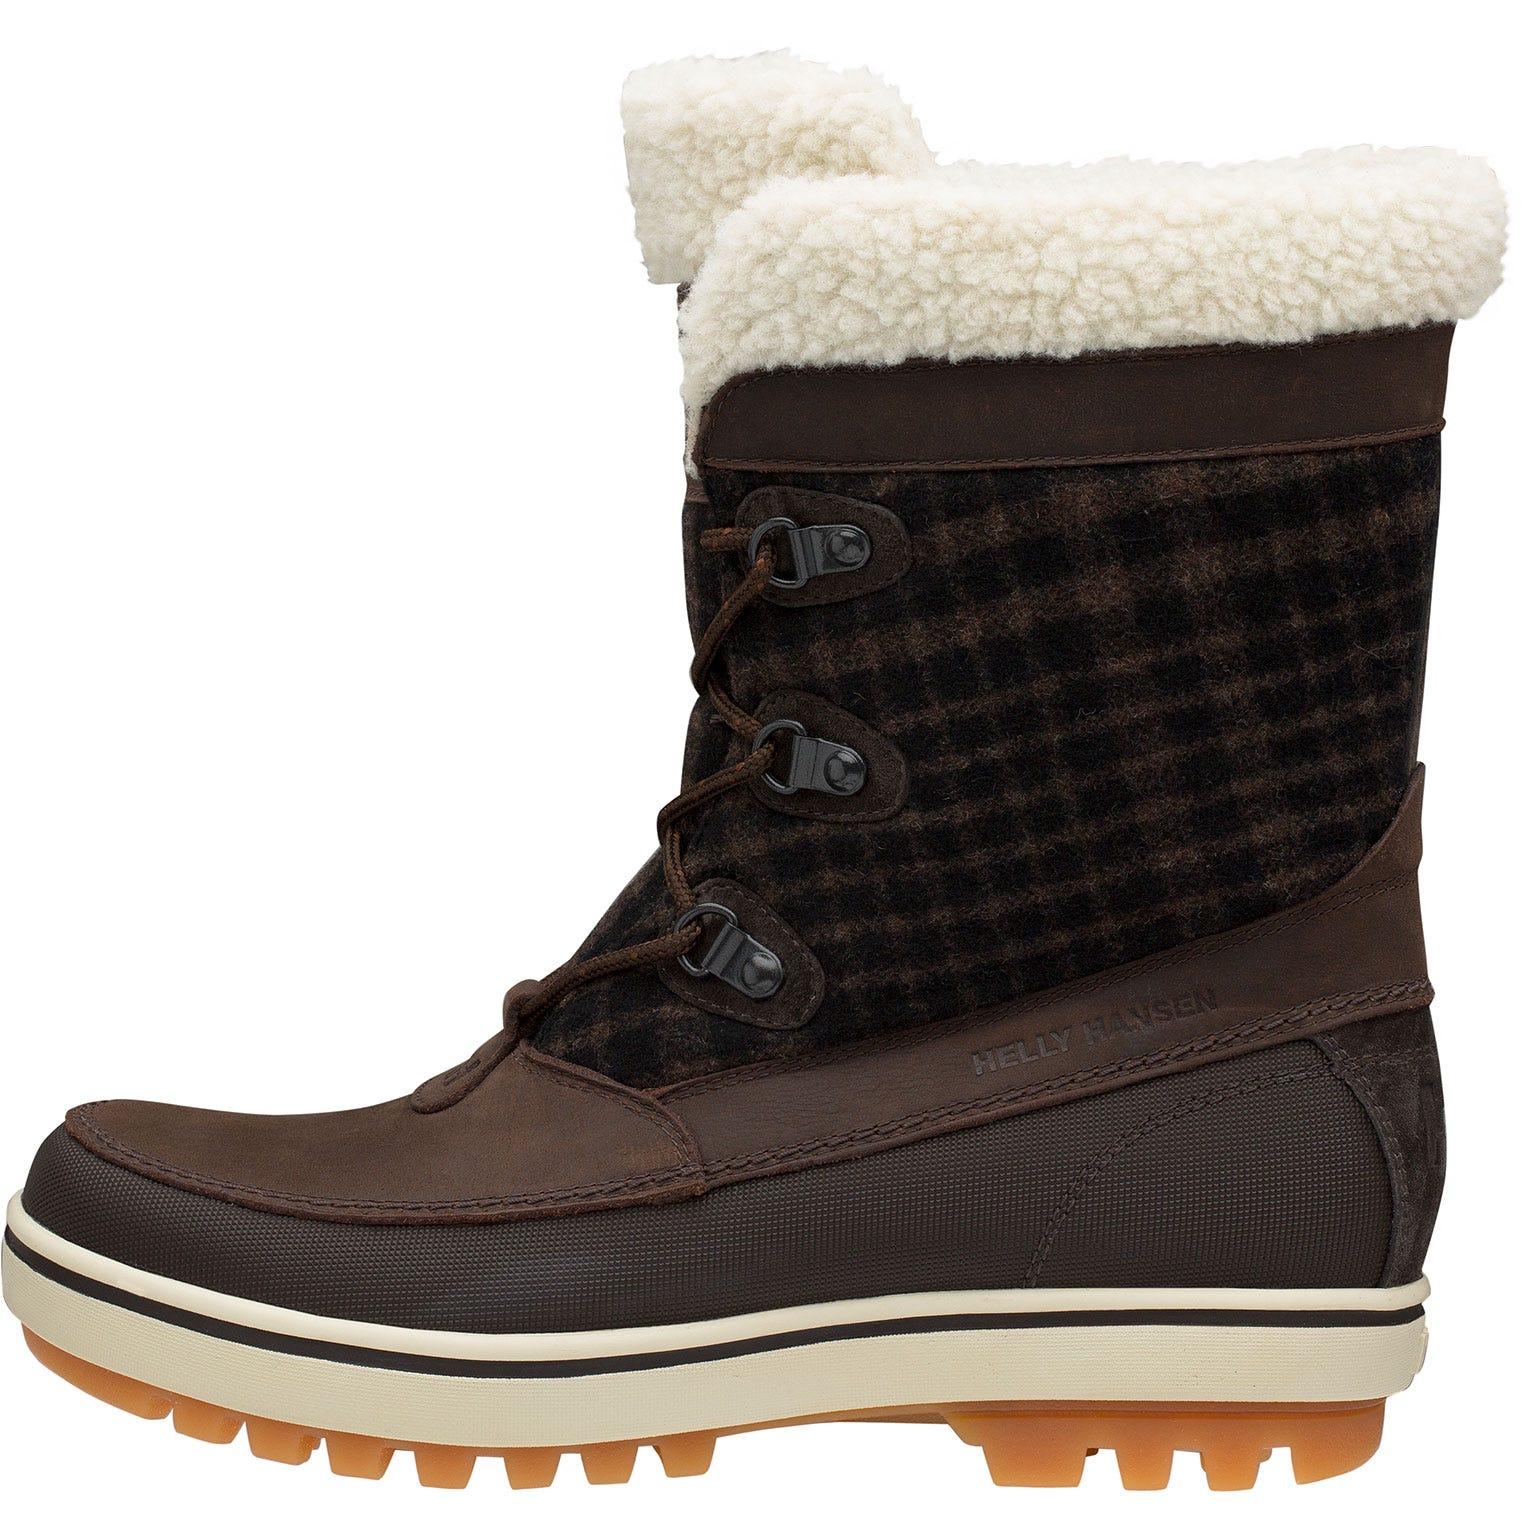 Helly Hansen W Georgina Womens Winter Boot Brown 40/8.5